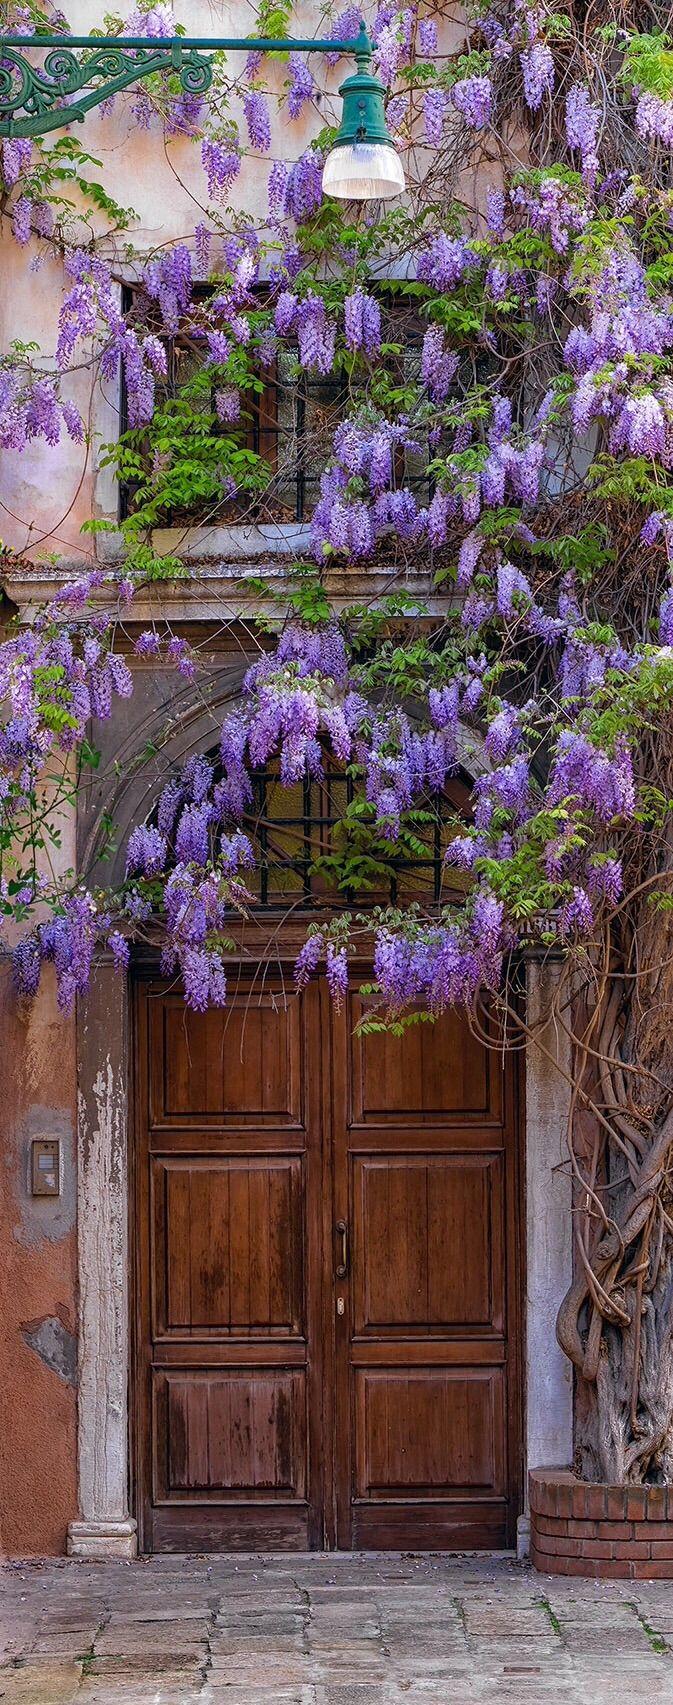 Venice, Italy   Peter Lik Photography ..rh